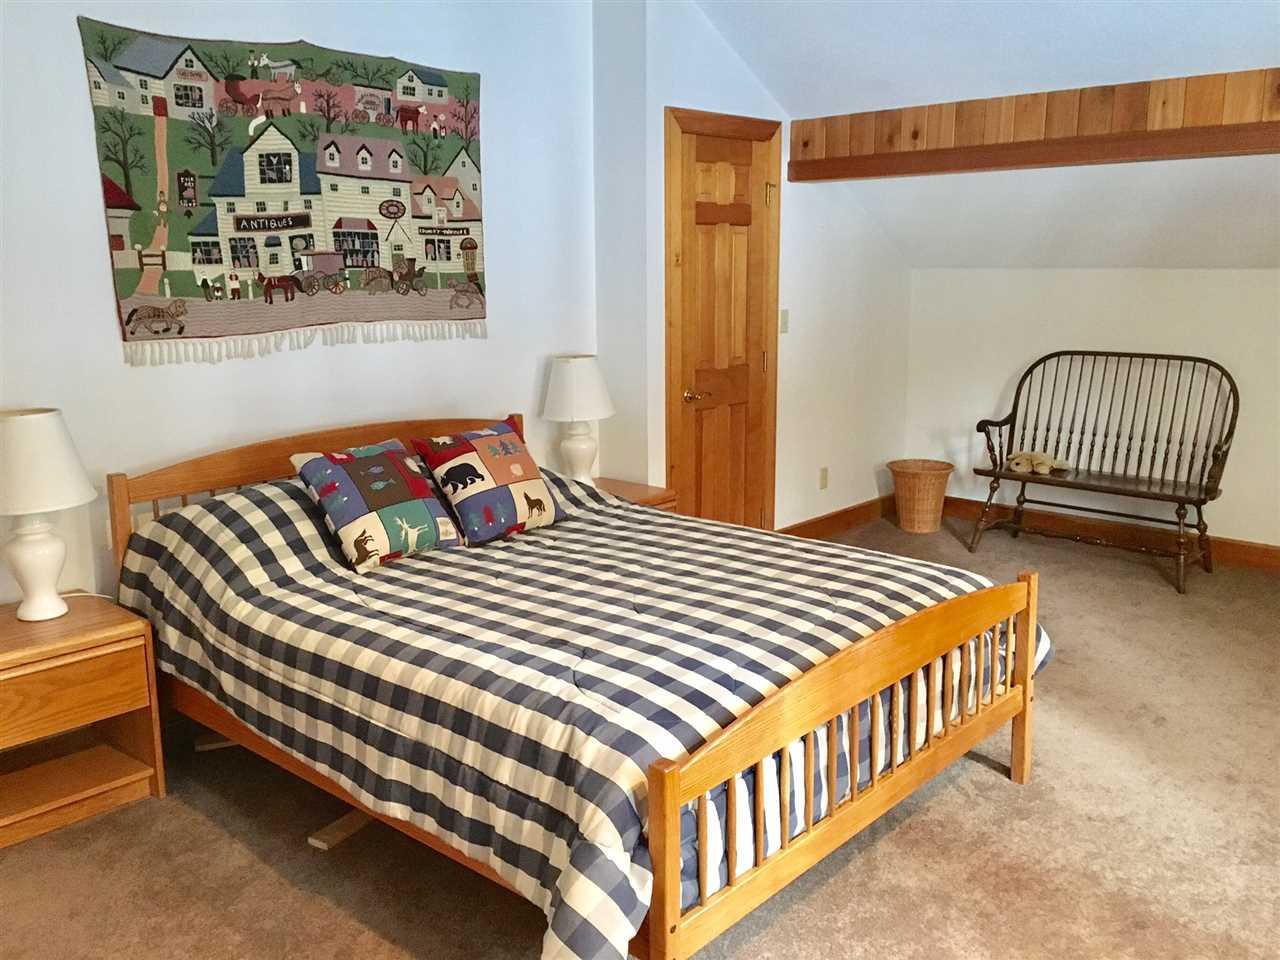 Mount-Snow-Real-Estate-4614113-23